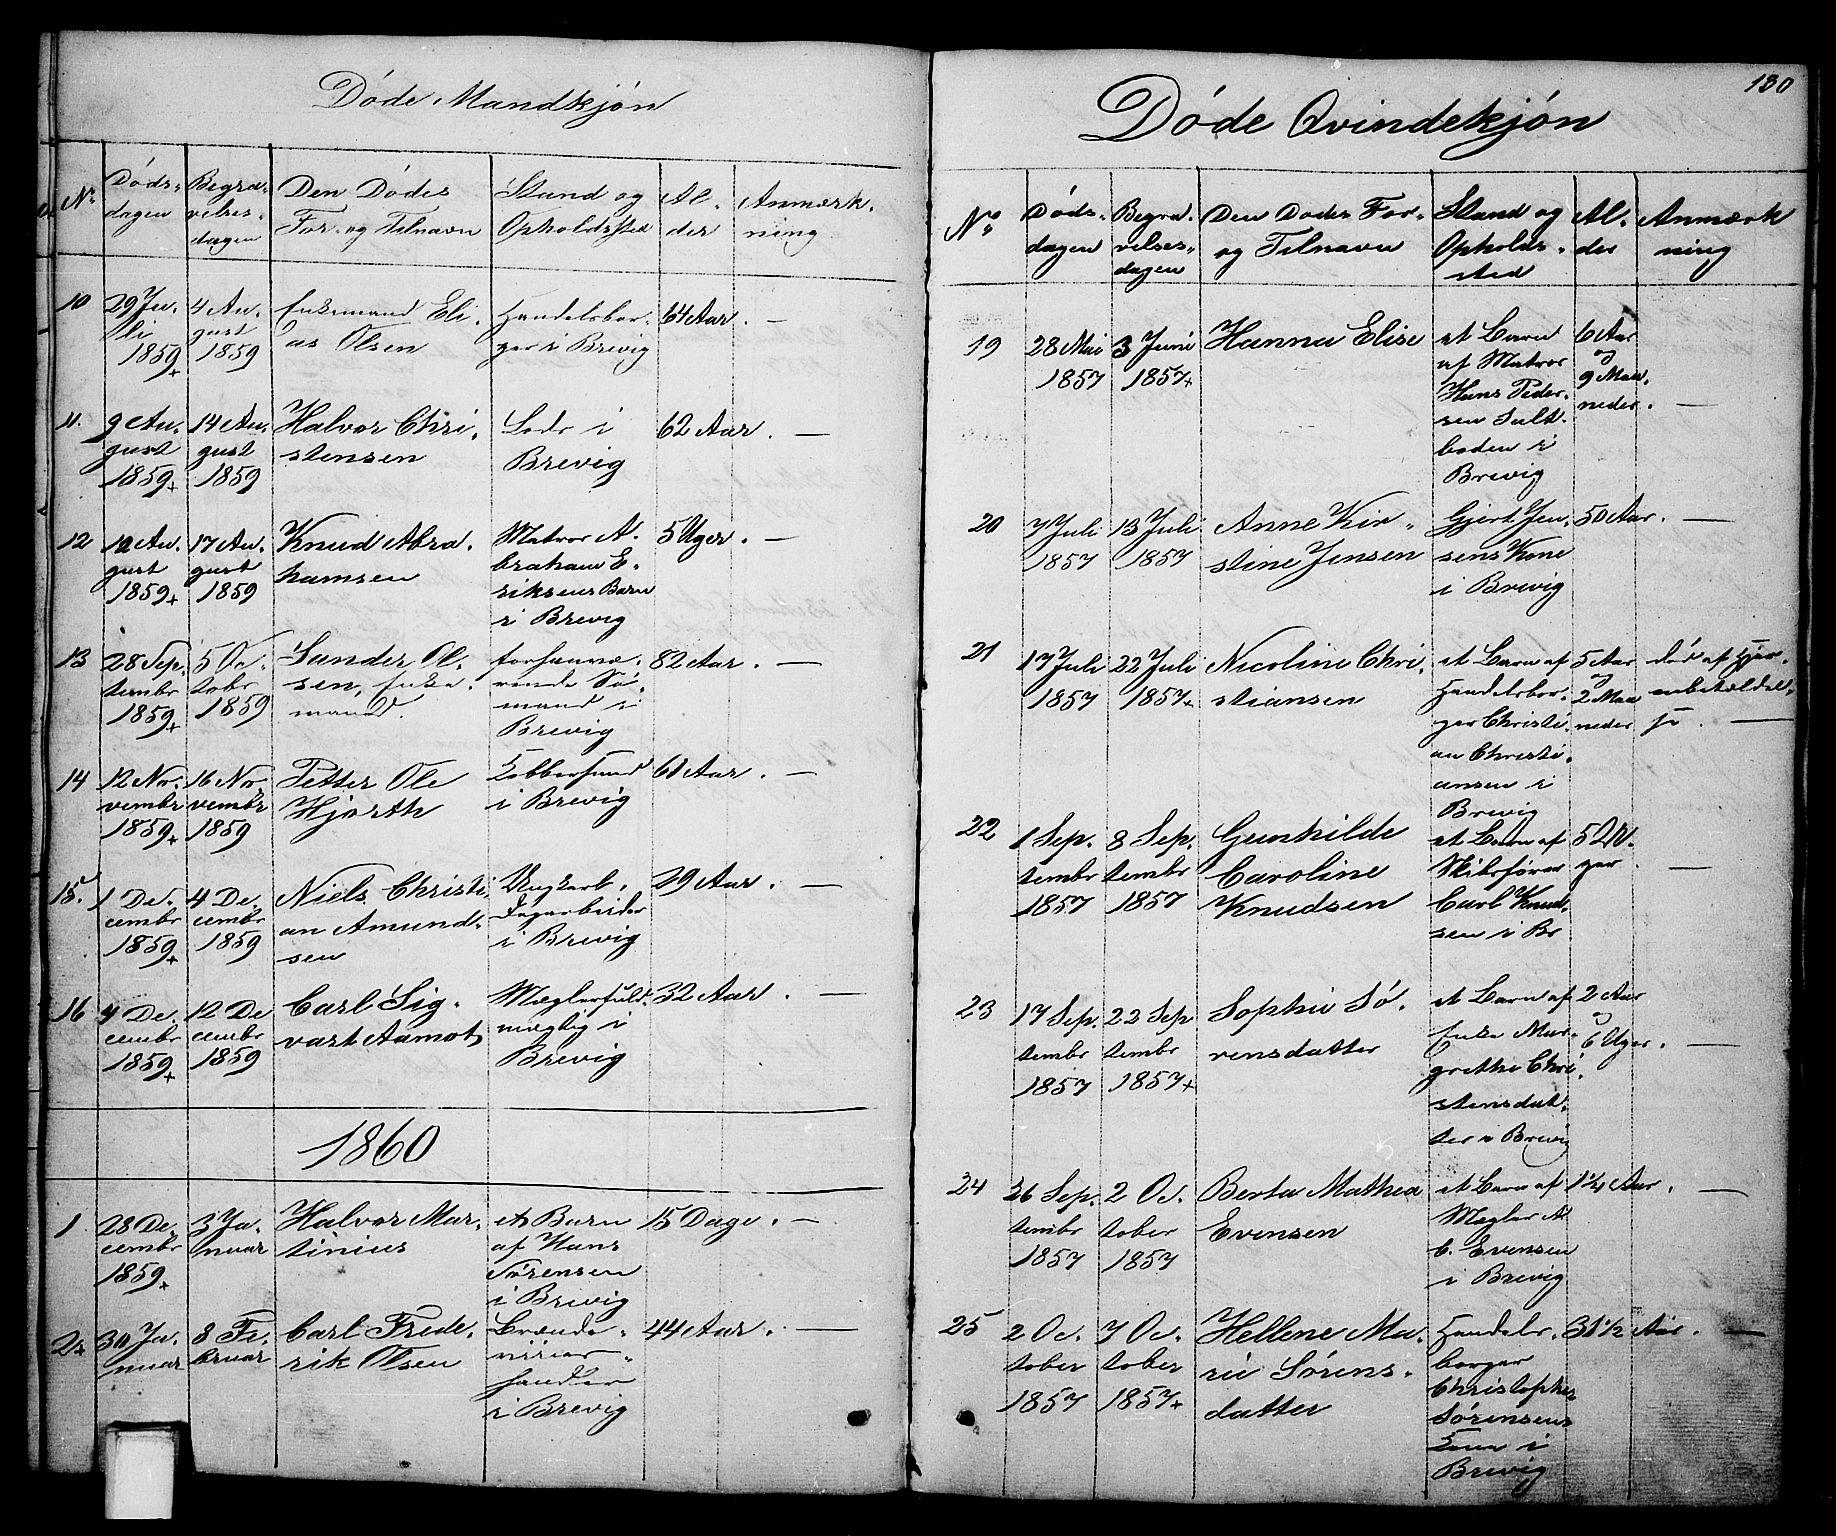 SAKO, Brevik kirkebøker, G/Ga/L0002: Klokkerbok nr. 2, 1846-1865, s. 130